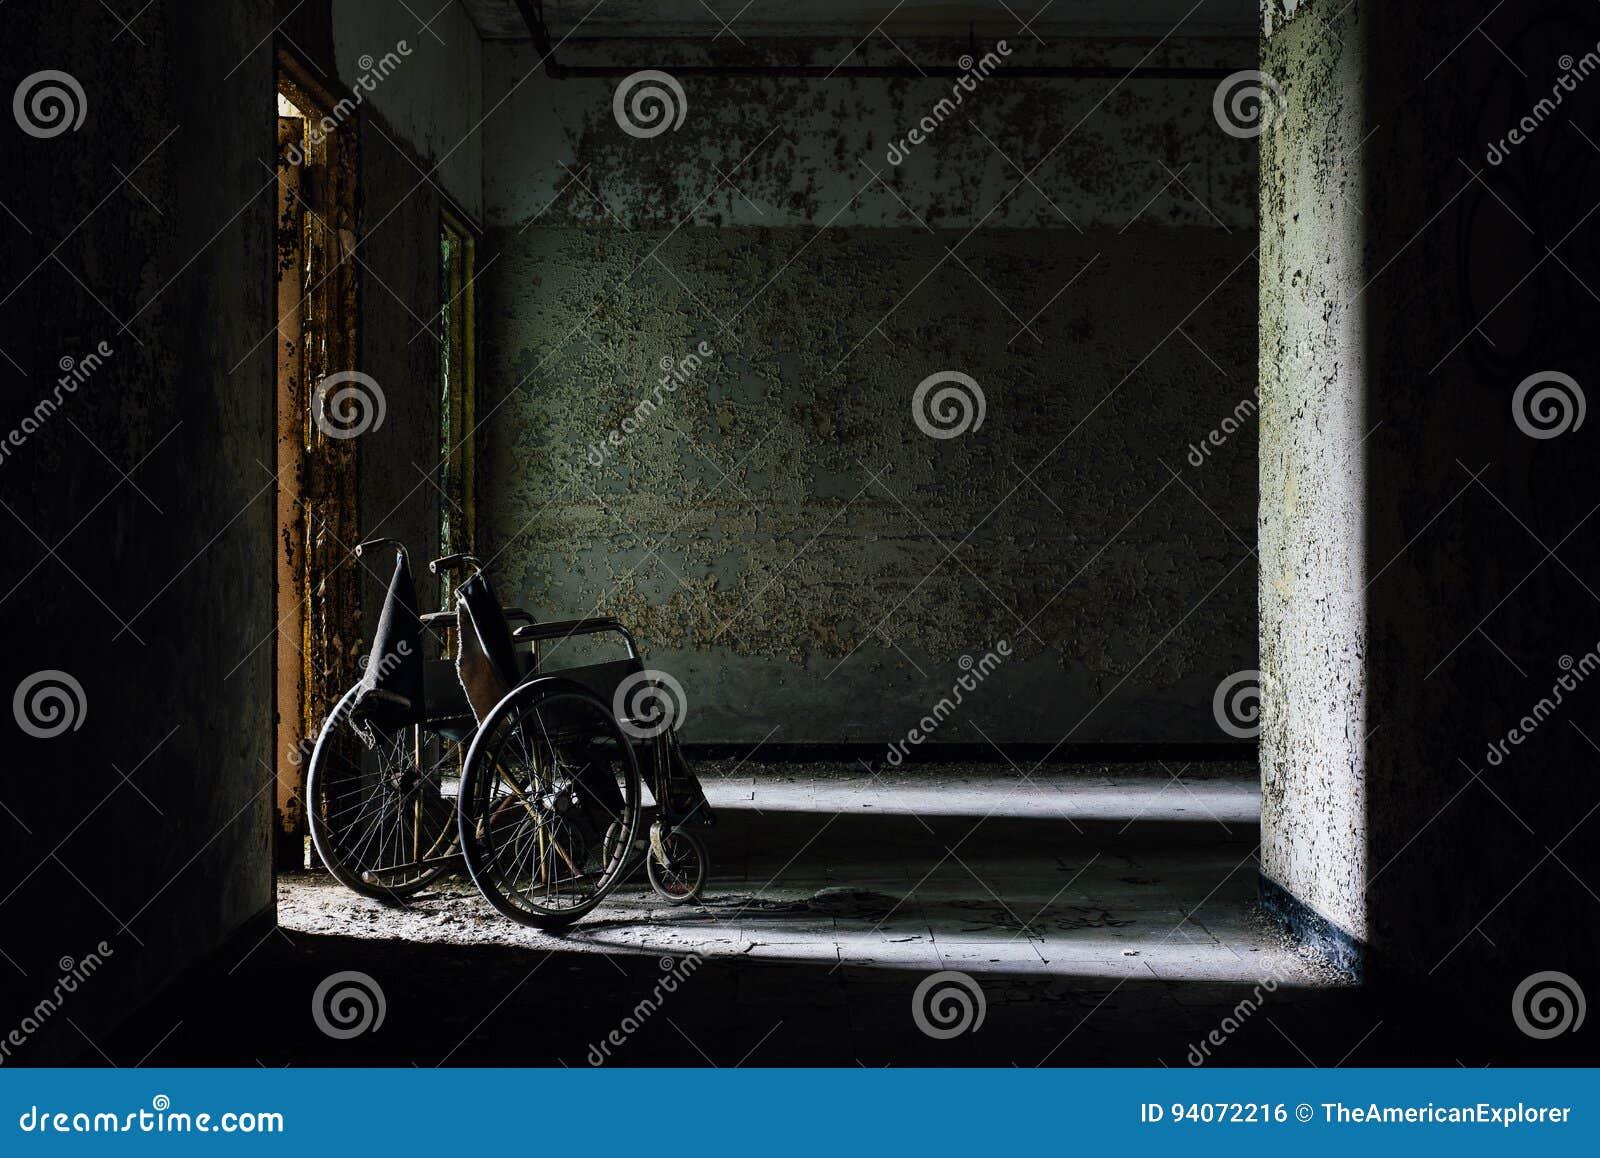 Vintage Wheelchair in Hallway - Abandoned Hospital / Sanitarium - New York